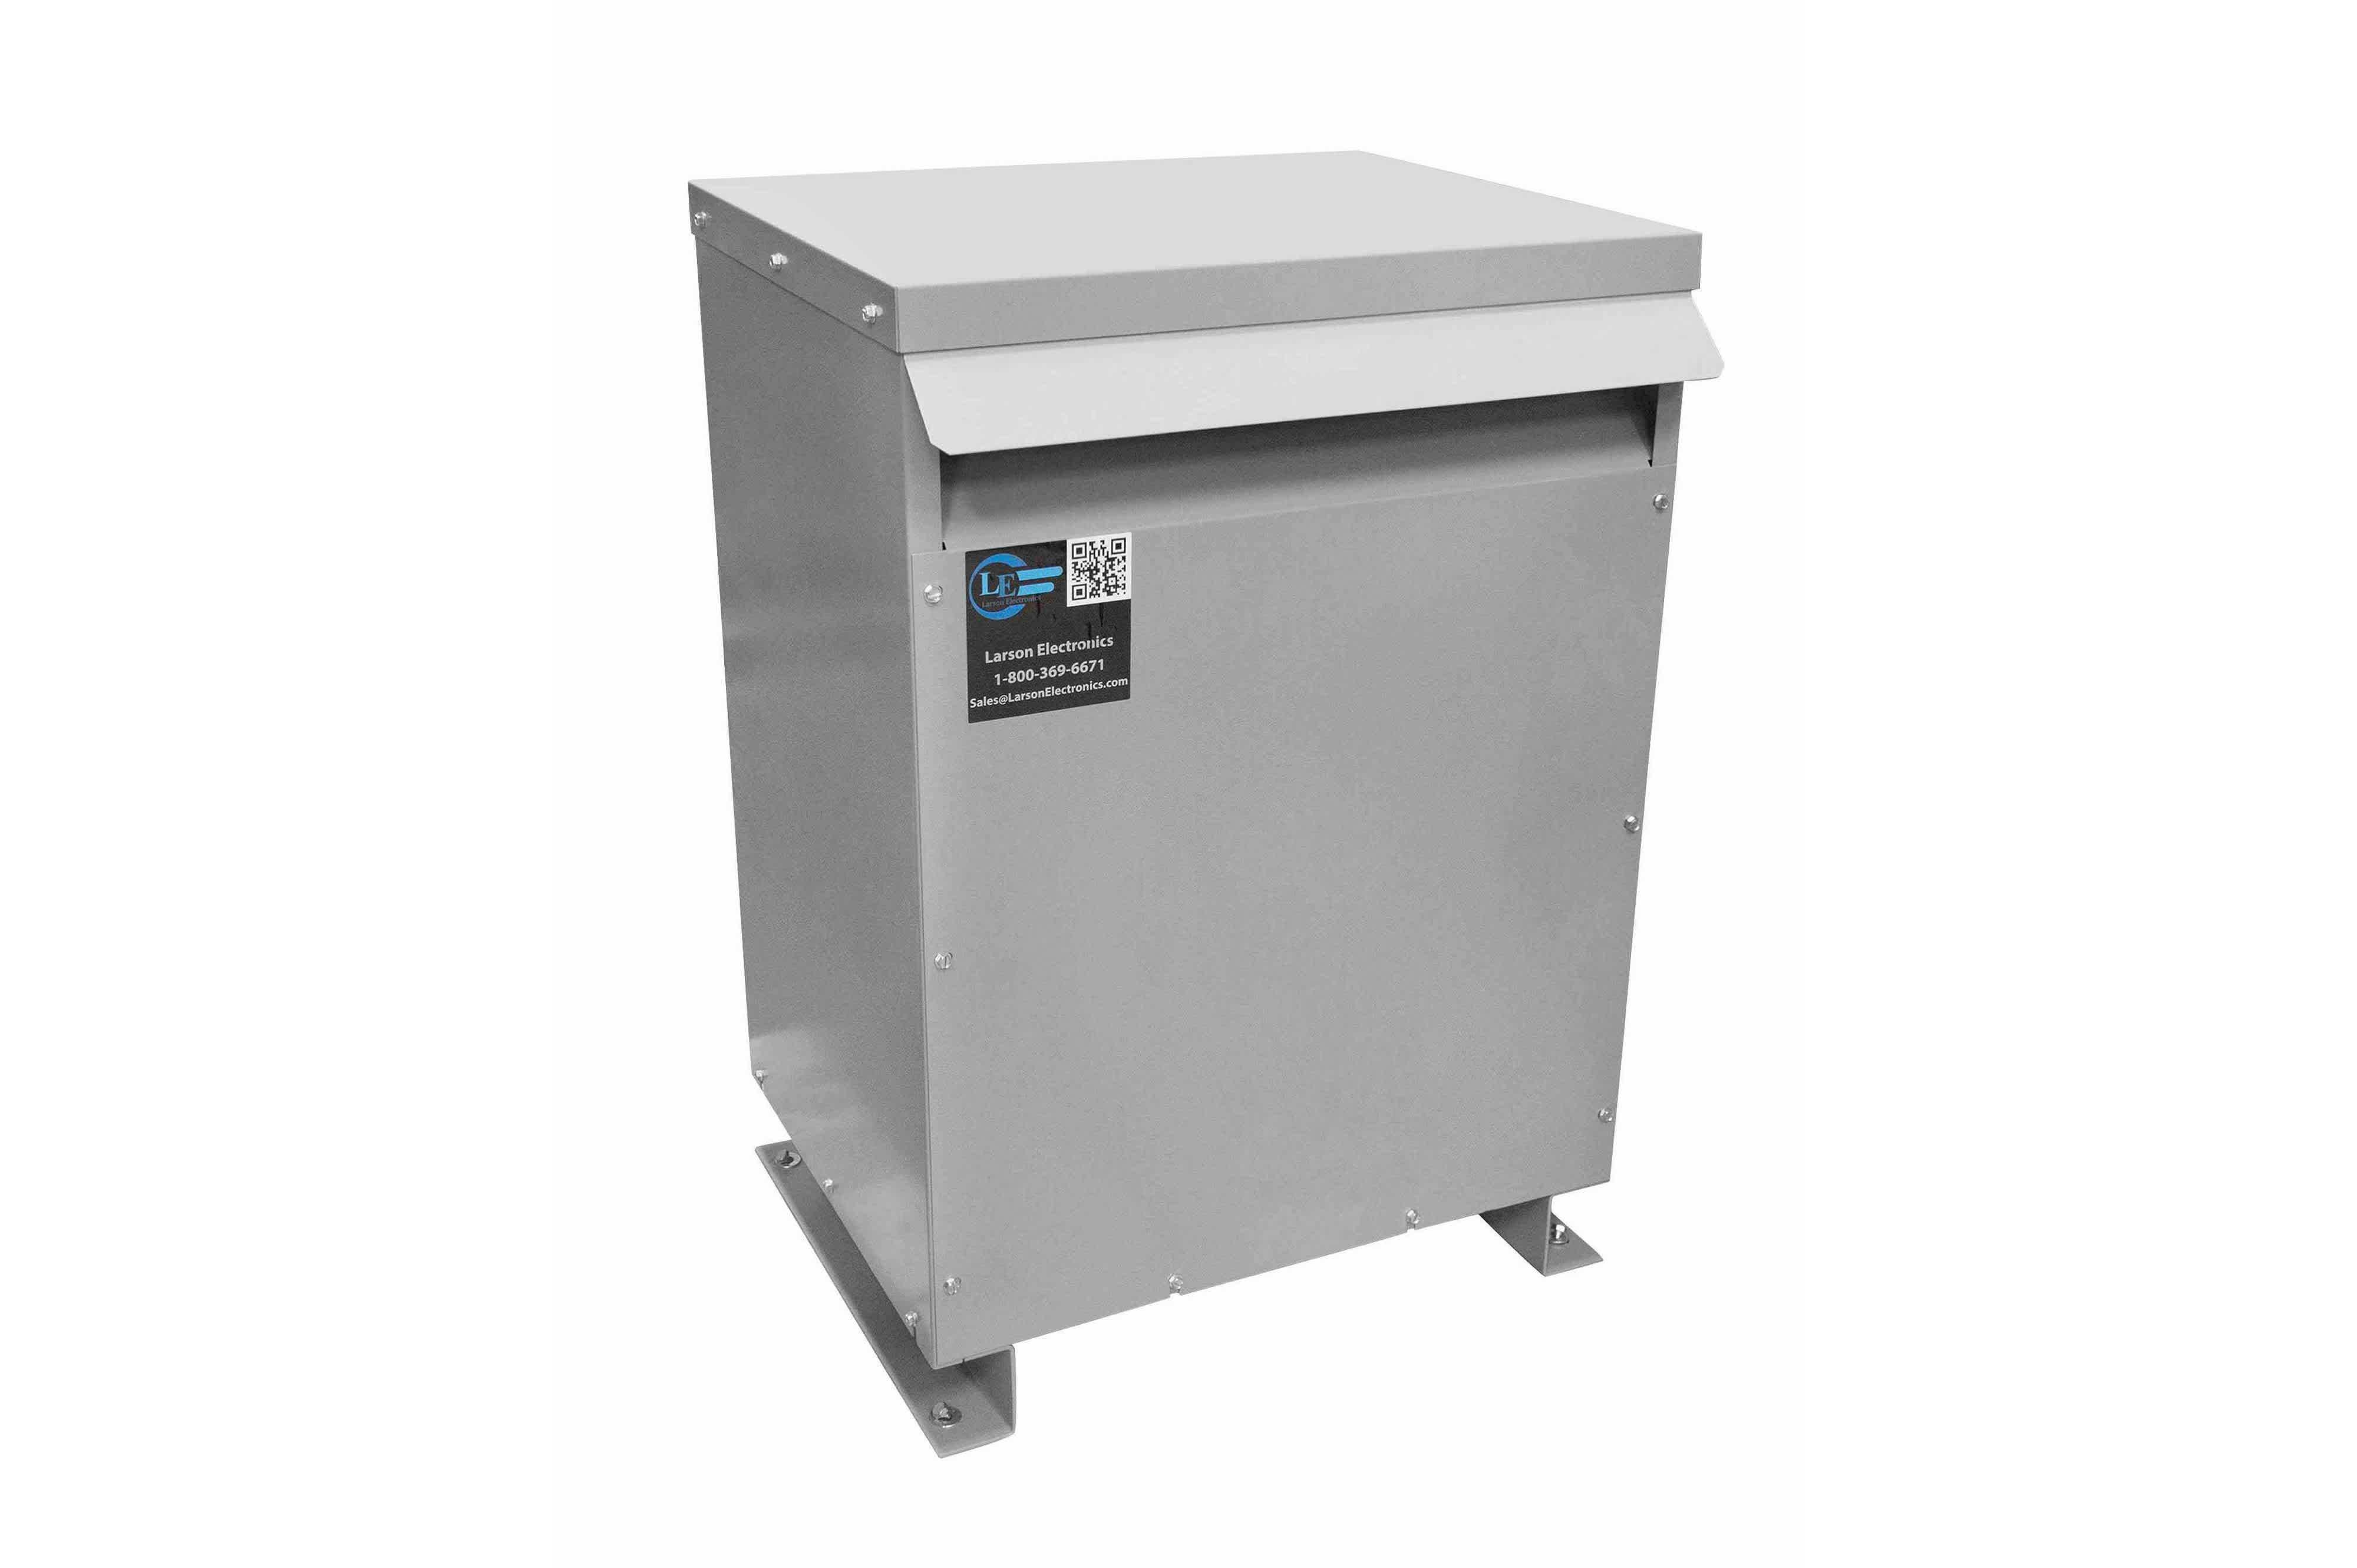 26 kVA 3PH Isolation Transformer, 600V Wye Primary, 240V Delta Secondary, N3R, Ventilated, 60 Hz